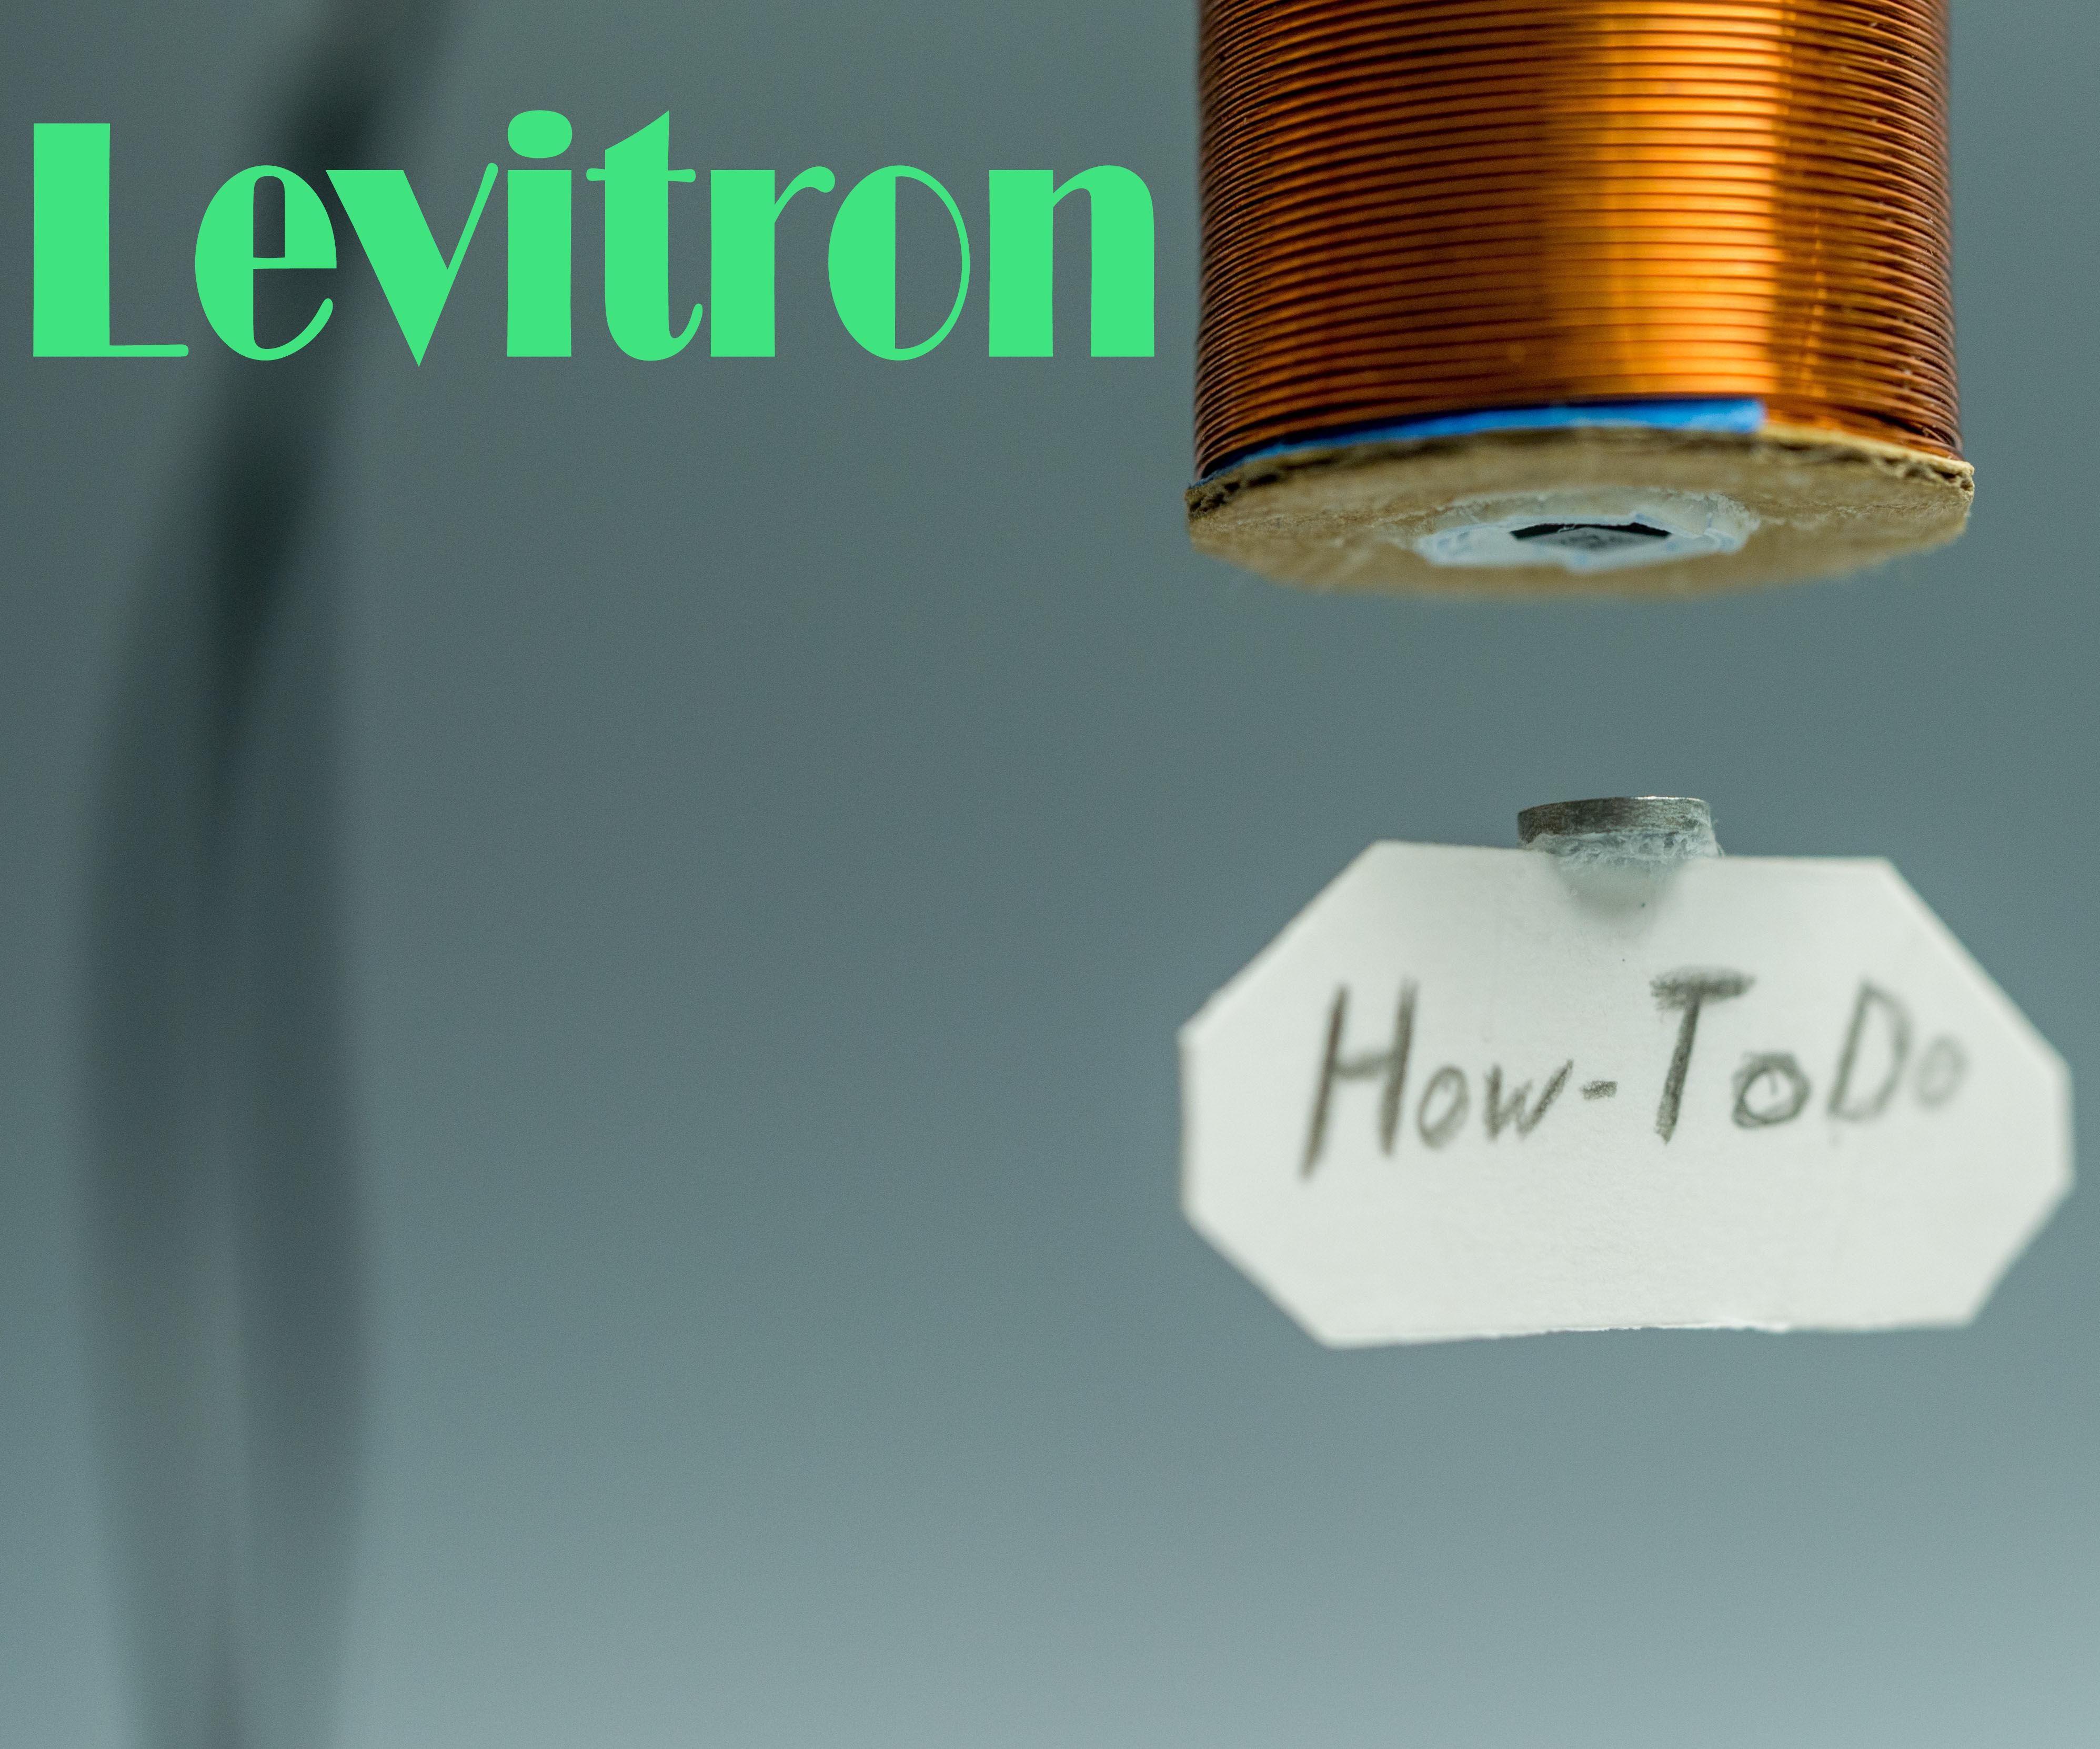 Levitron (electromagnetic levitation device)